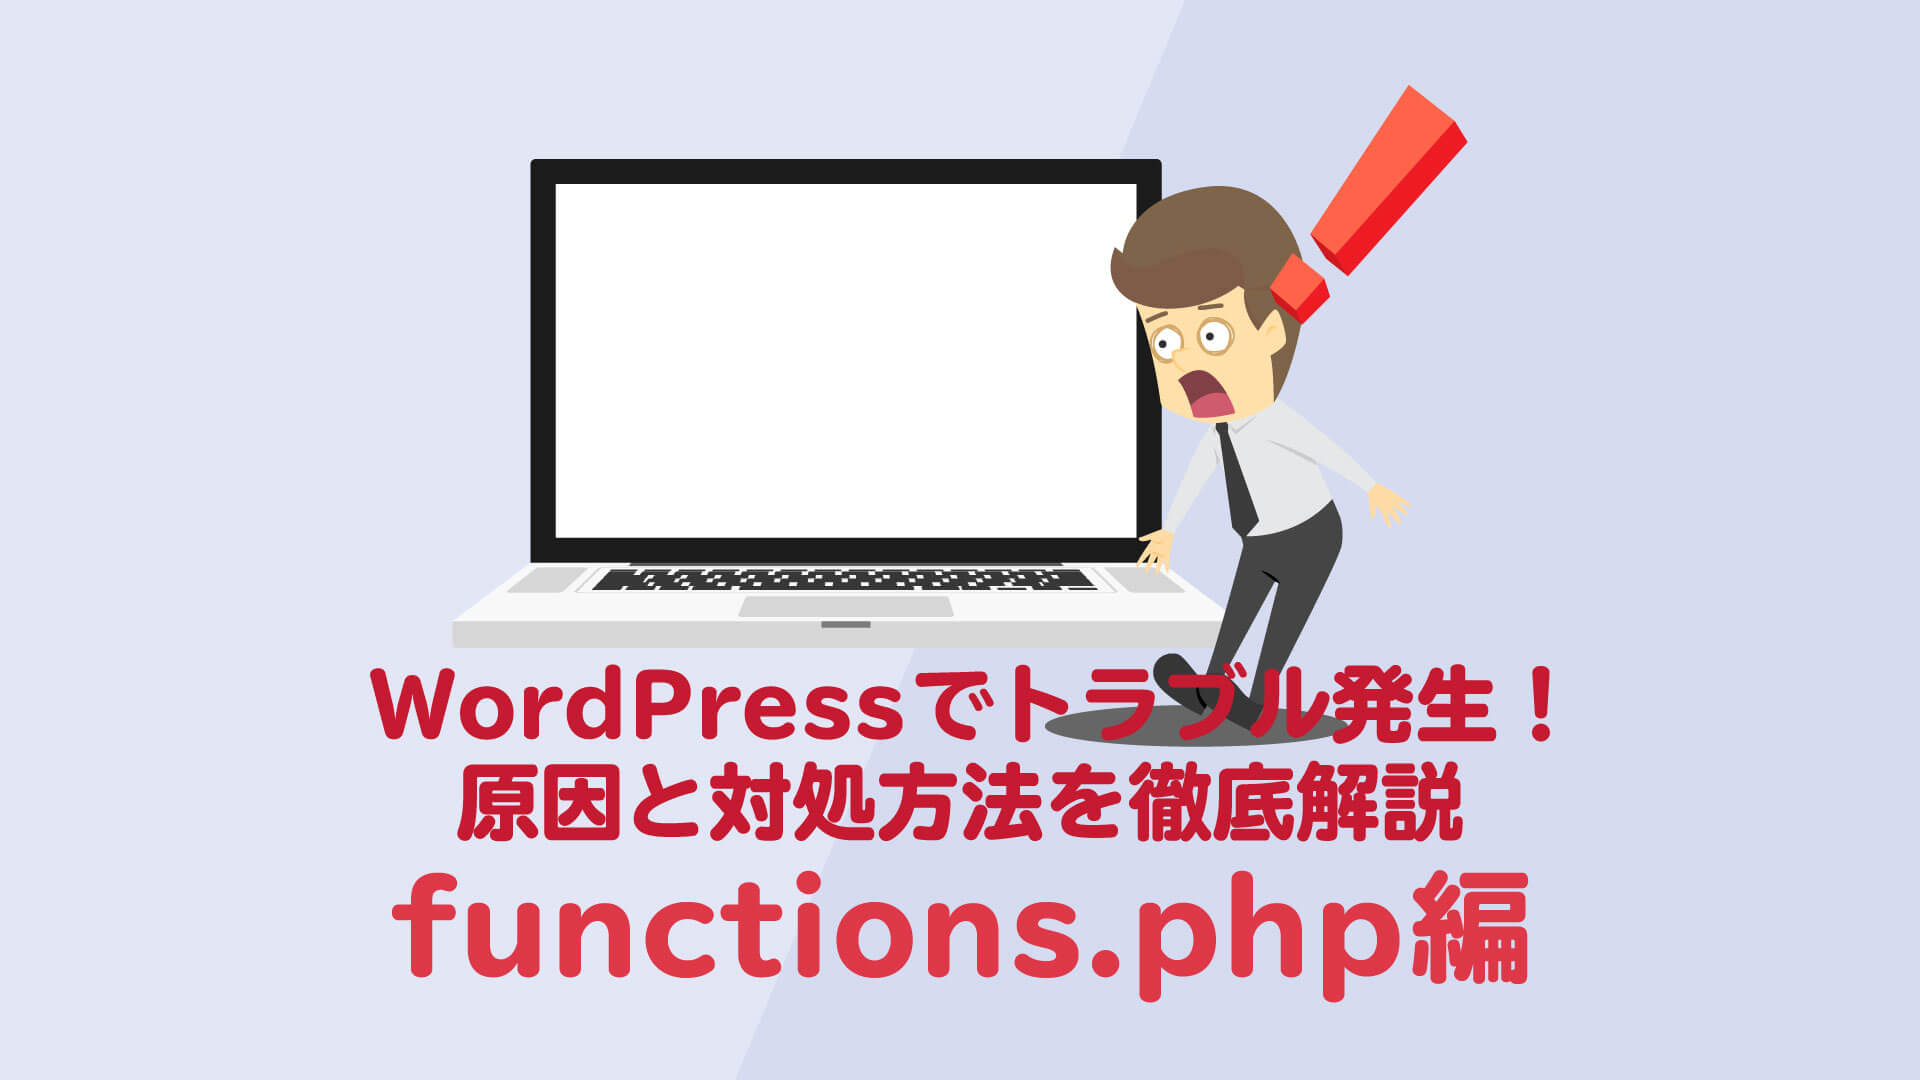 WordPressで画面が真っ白!原因と対処方法を徹底解説[functions.php編] - アウトプットを ...